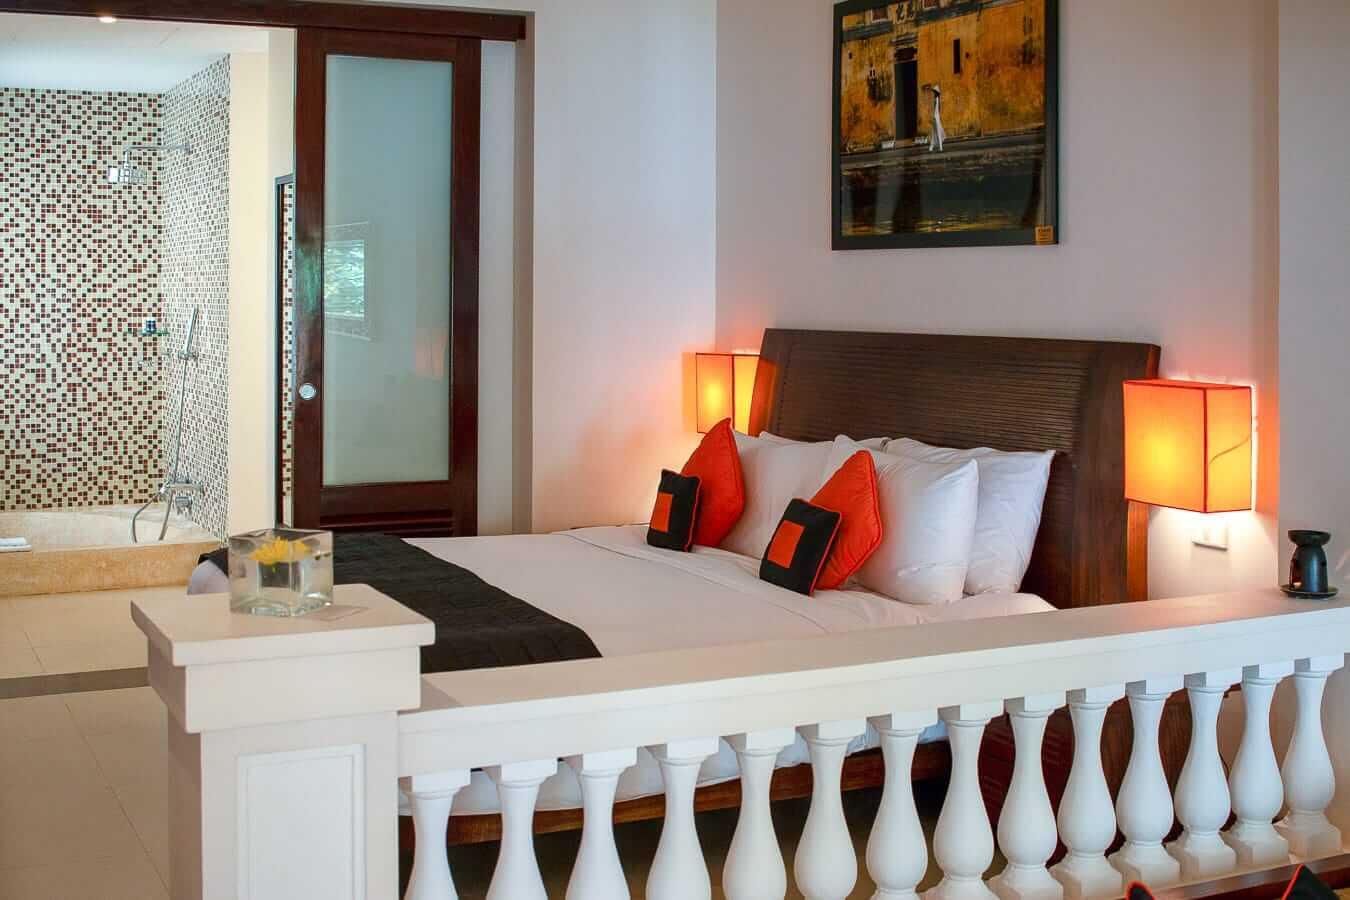 Anantara Hotel: Best Hoi An hotels